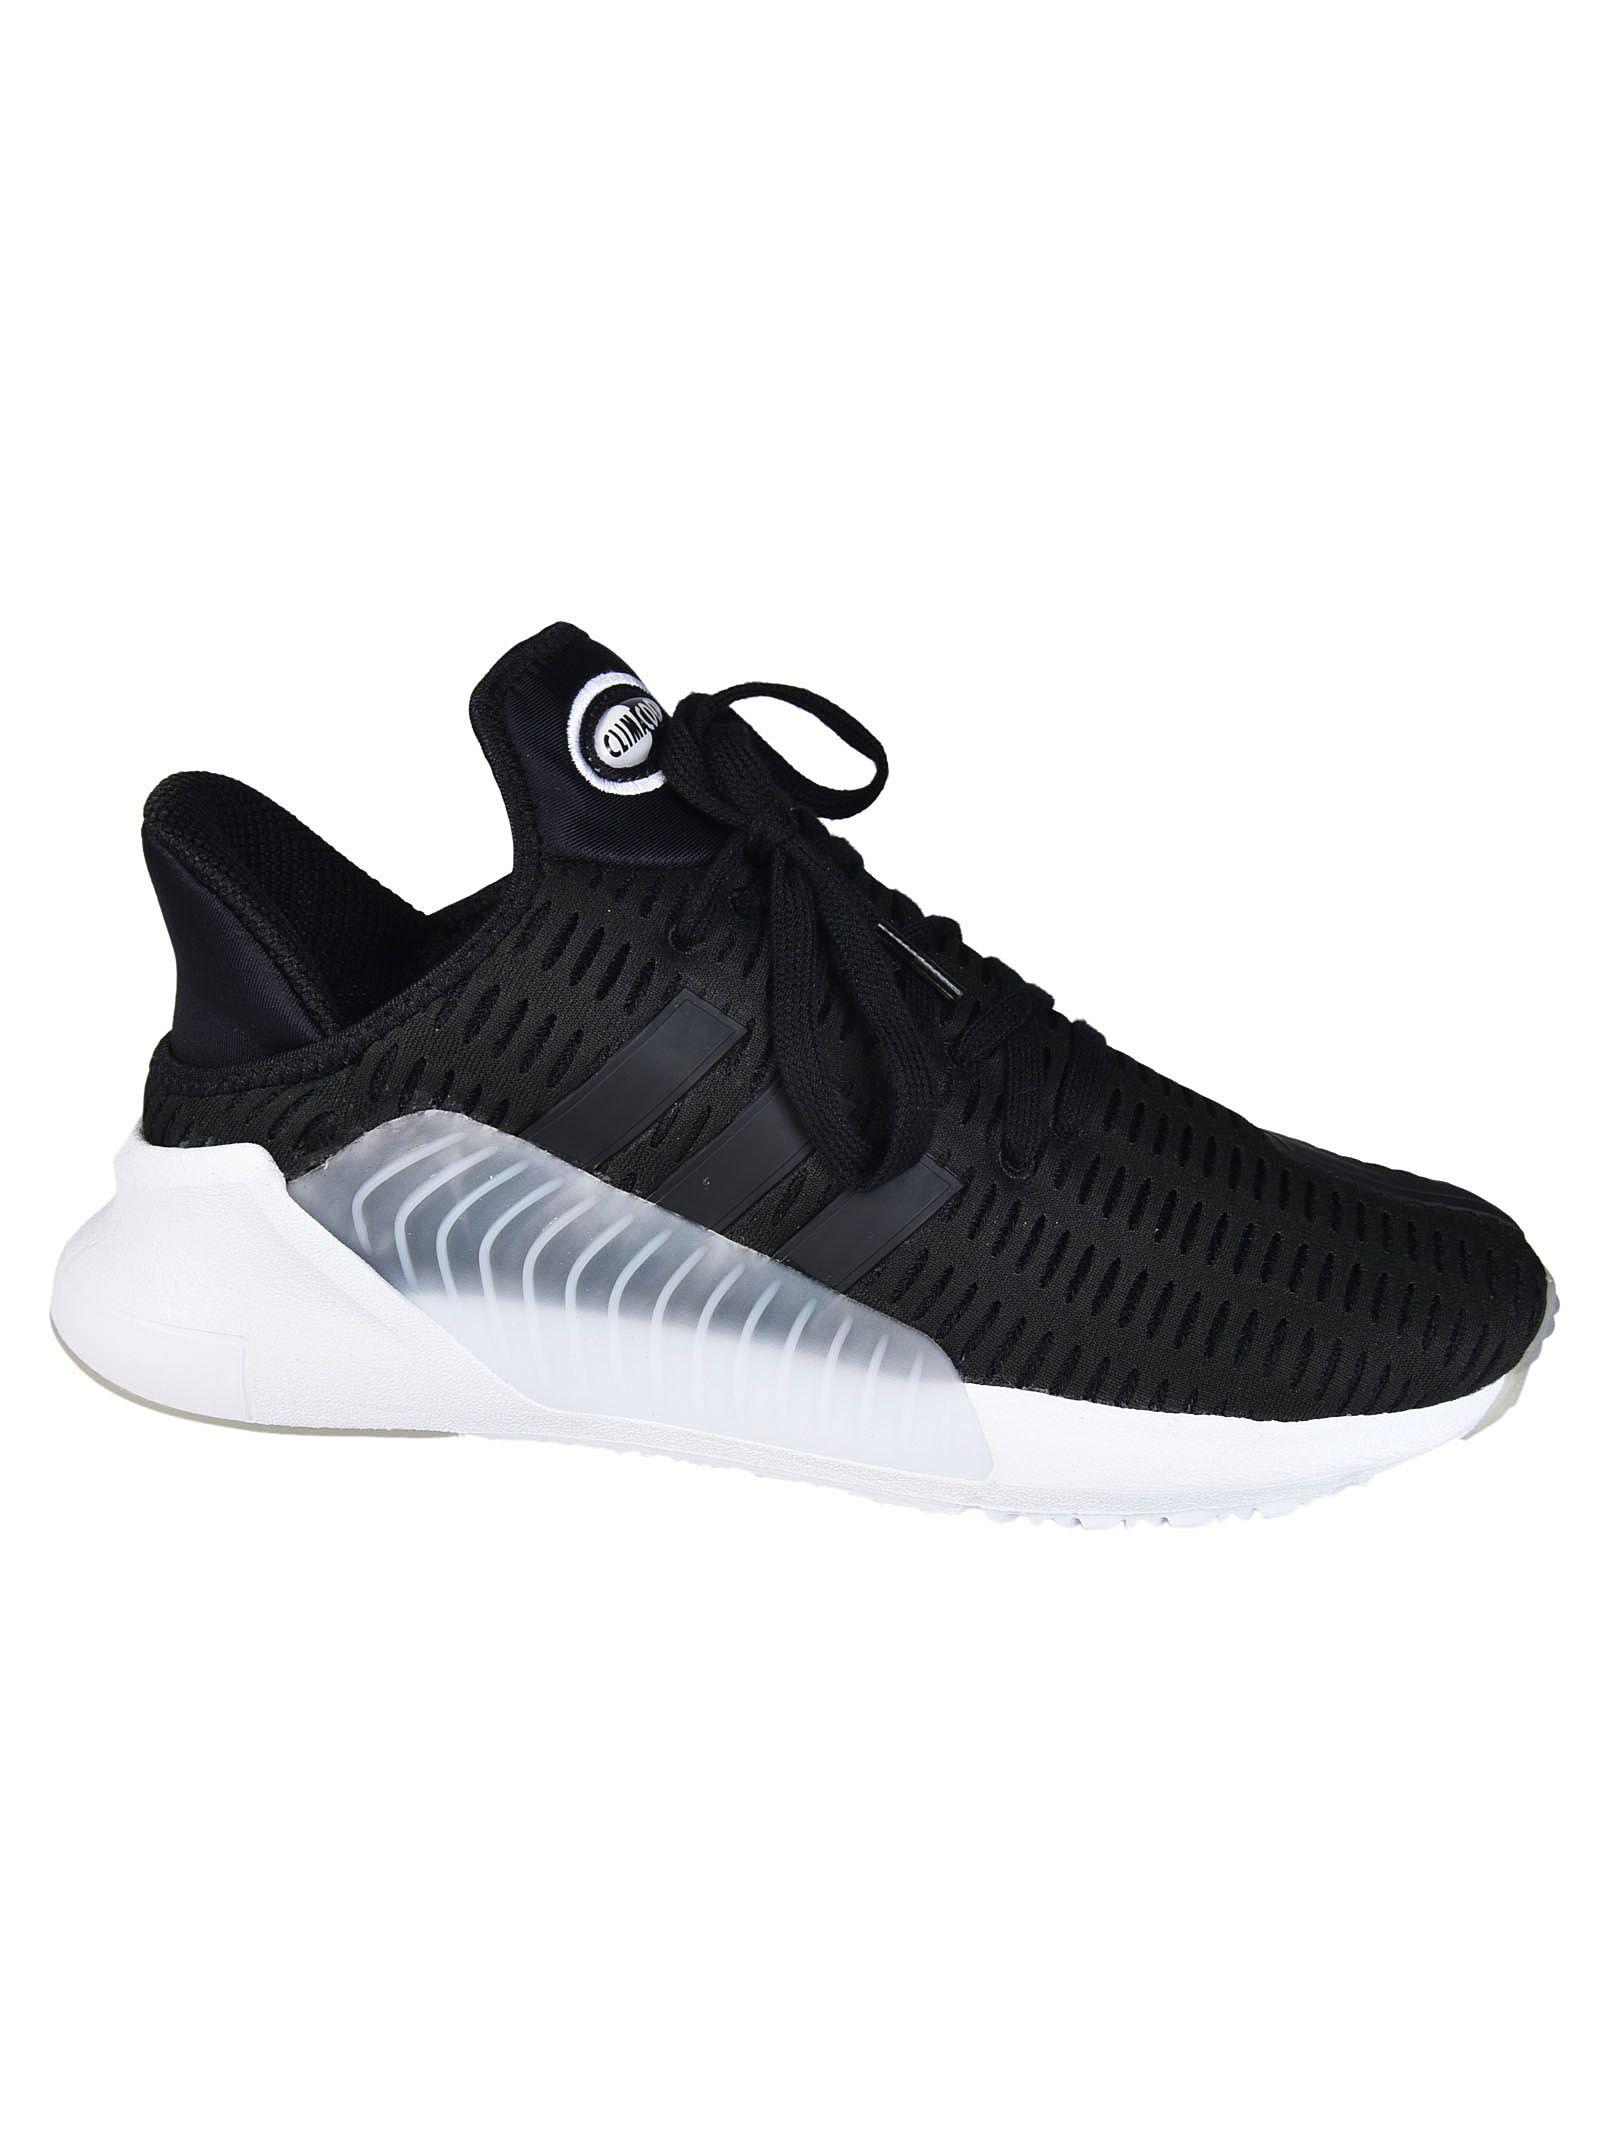 Adidas Originals Climacool Sneakers